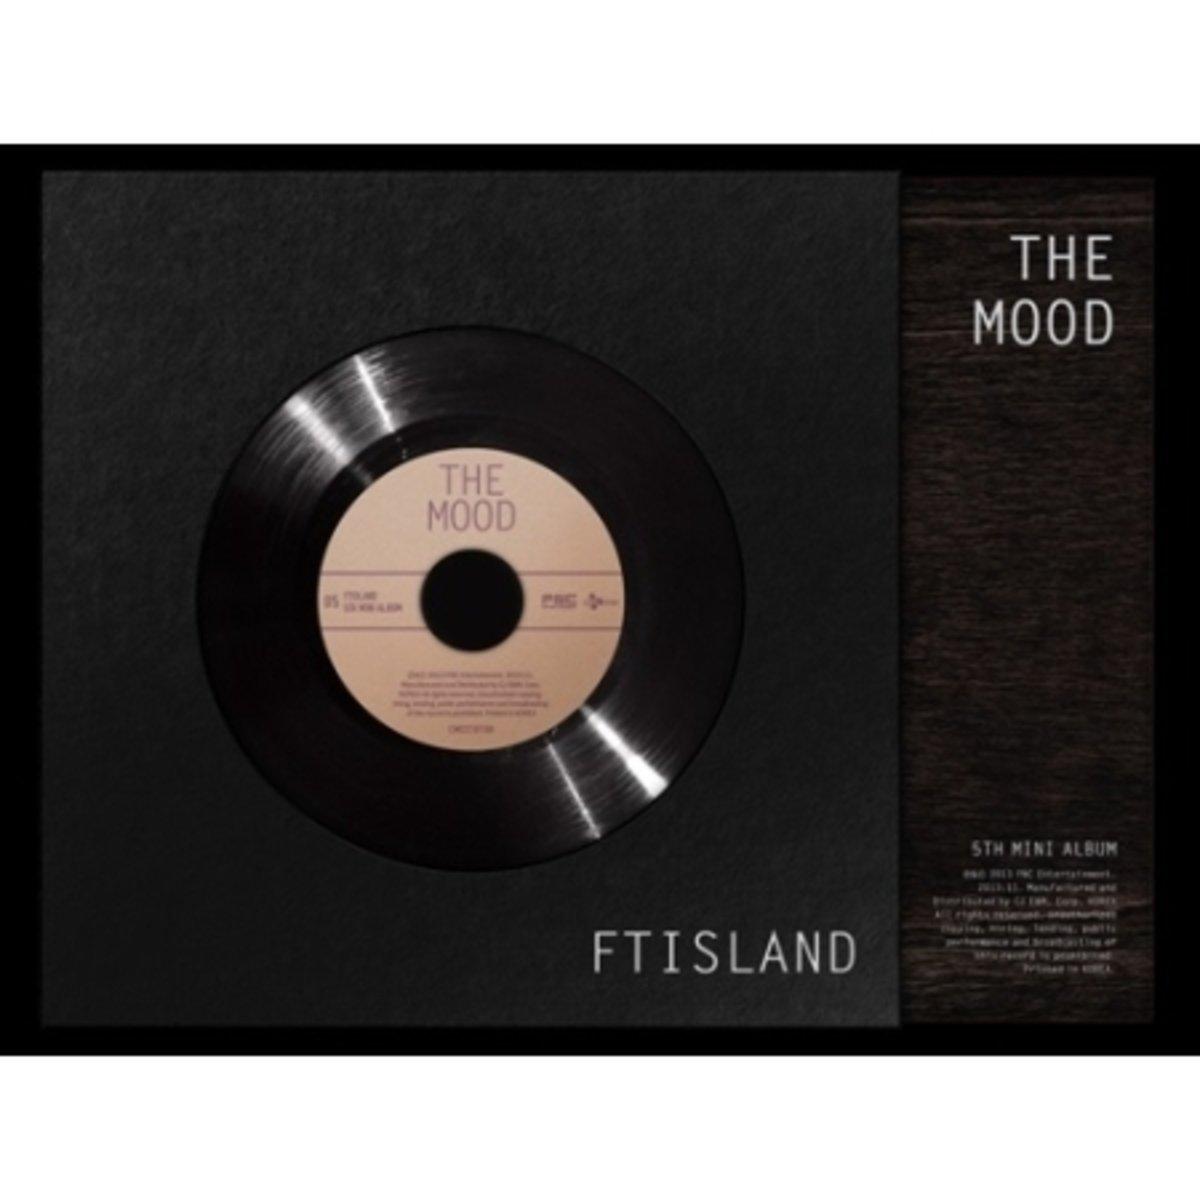 FTISLAND - Mini Album Vol.5  [THE MOOD]_47371